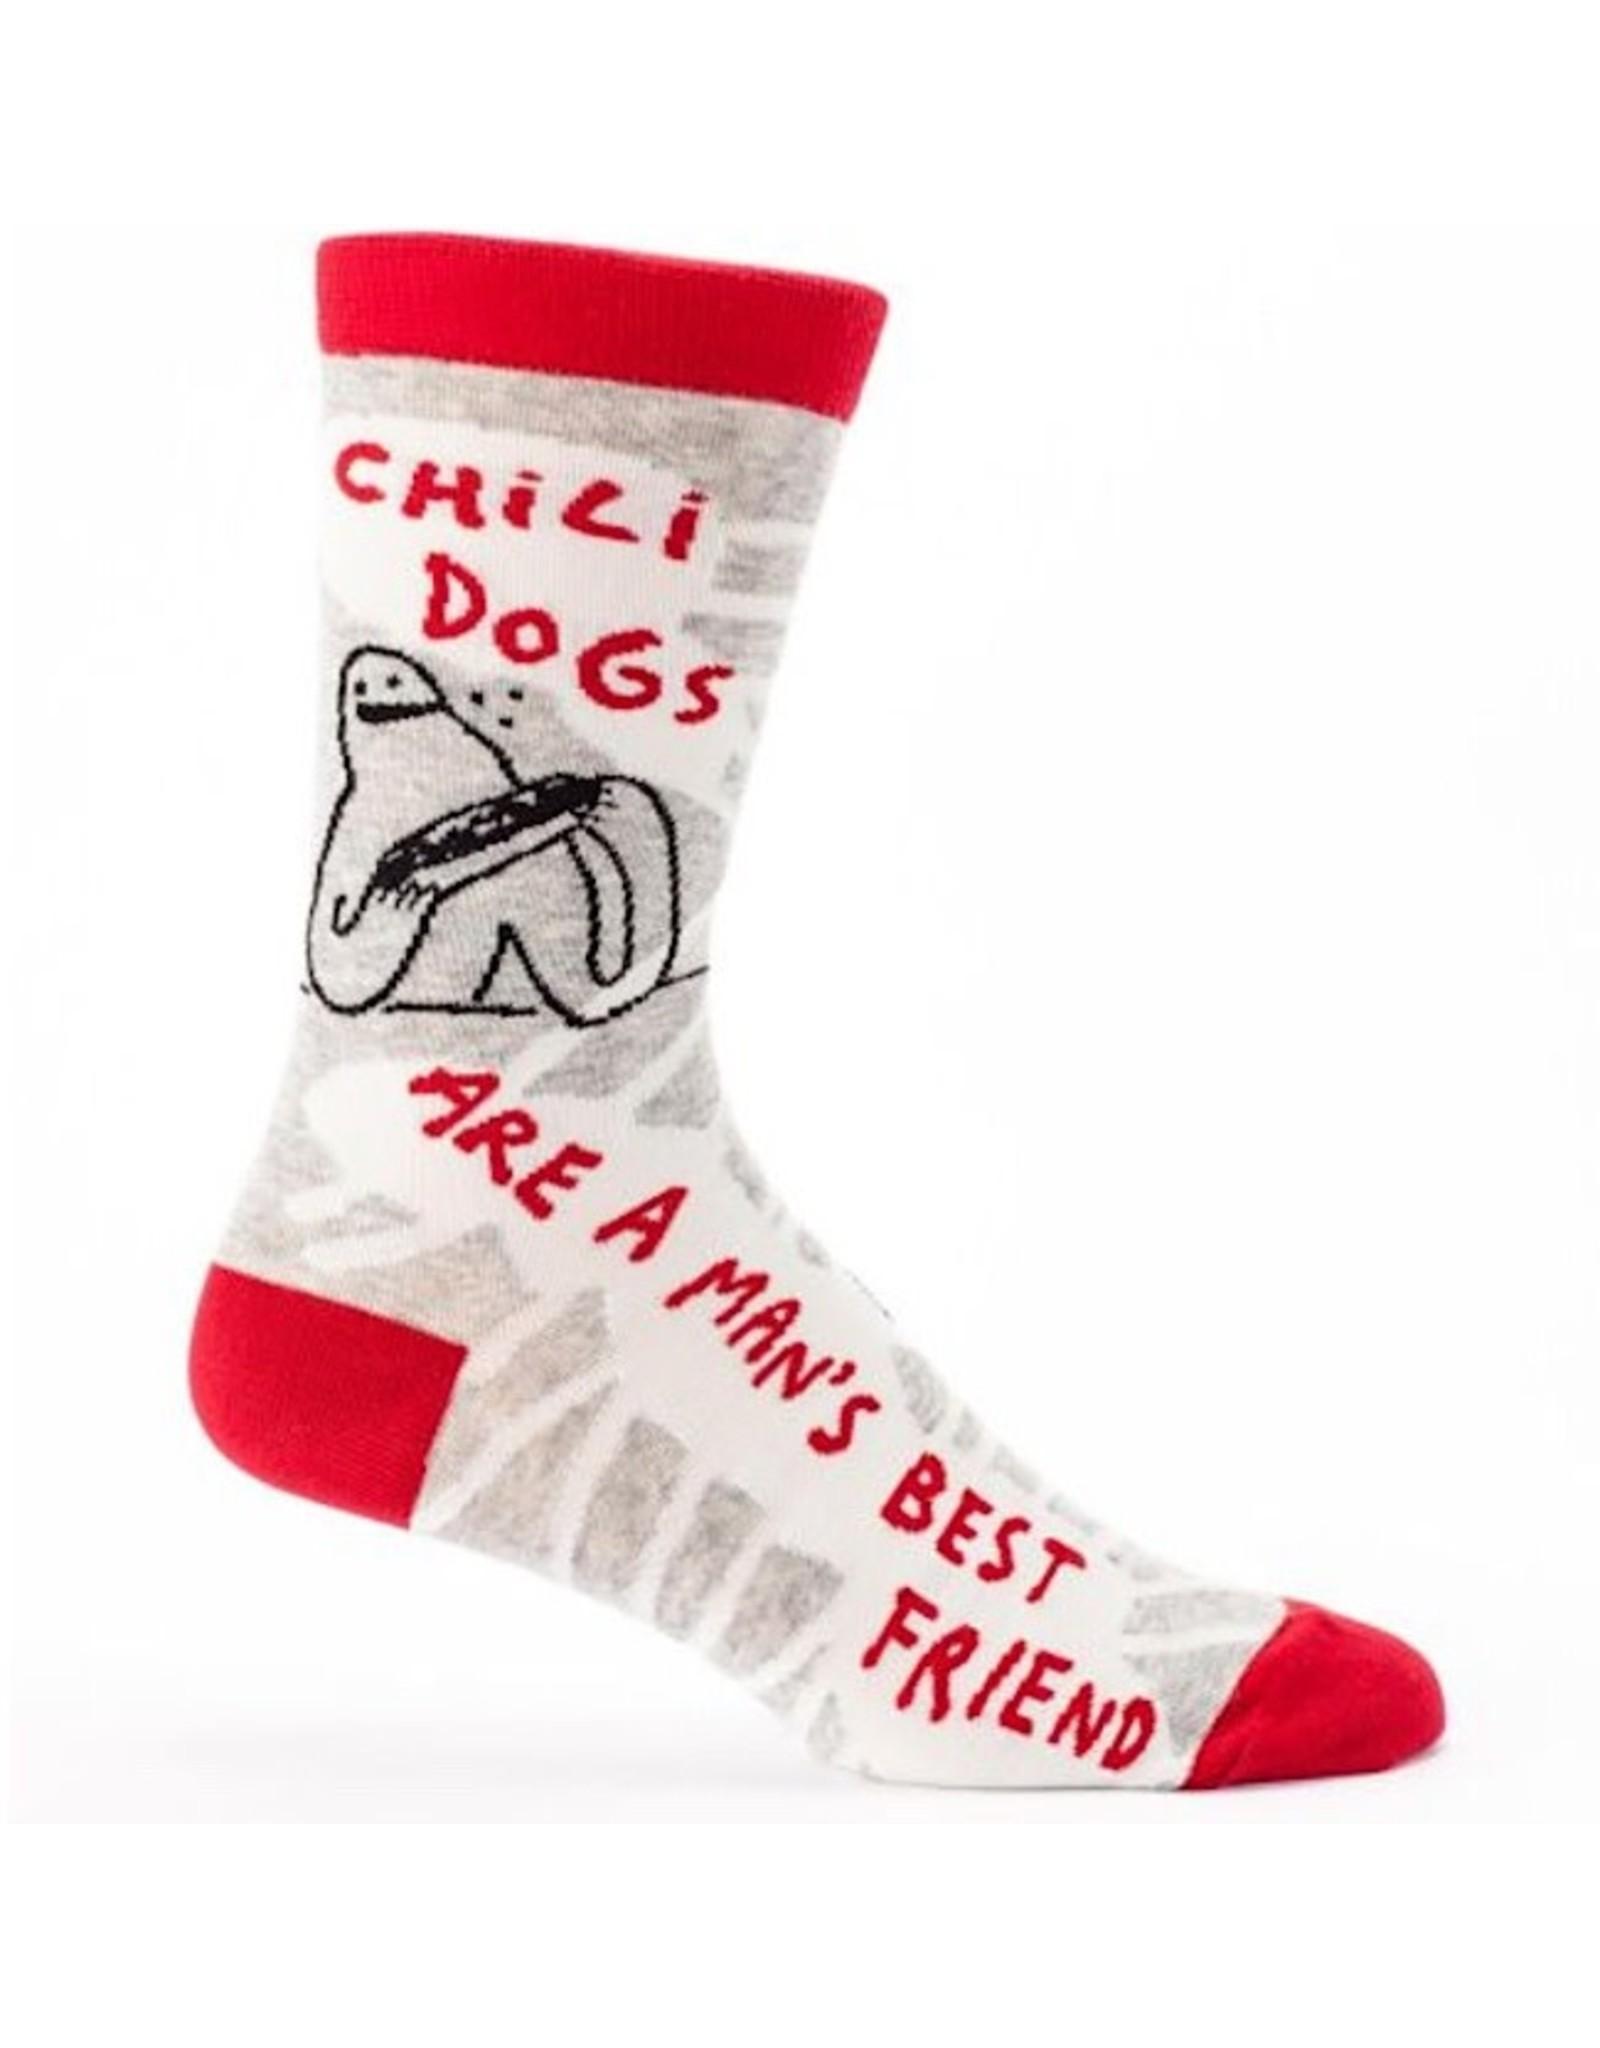 Socks (Mens)  - Chilidogs